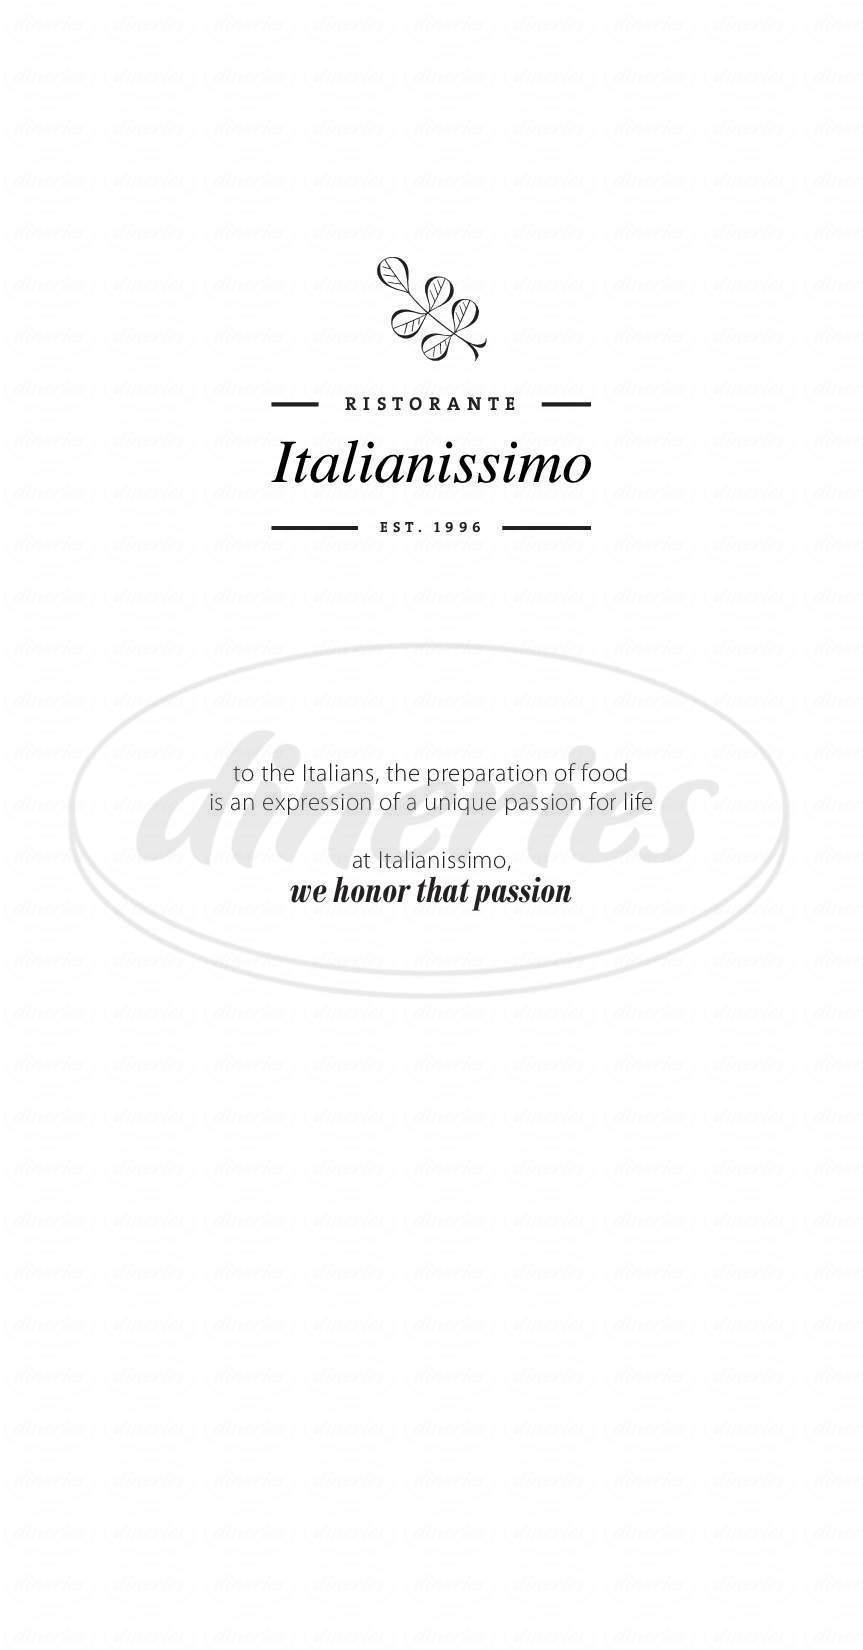 menu for Italianissimo Ristorante